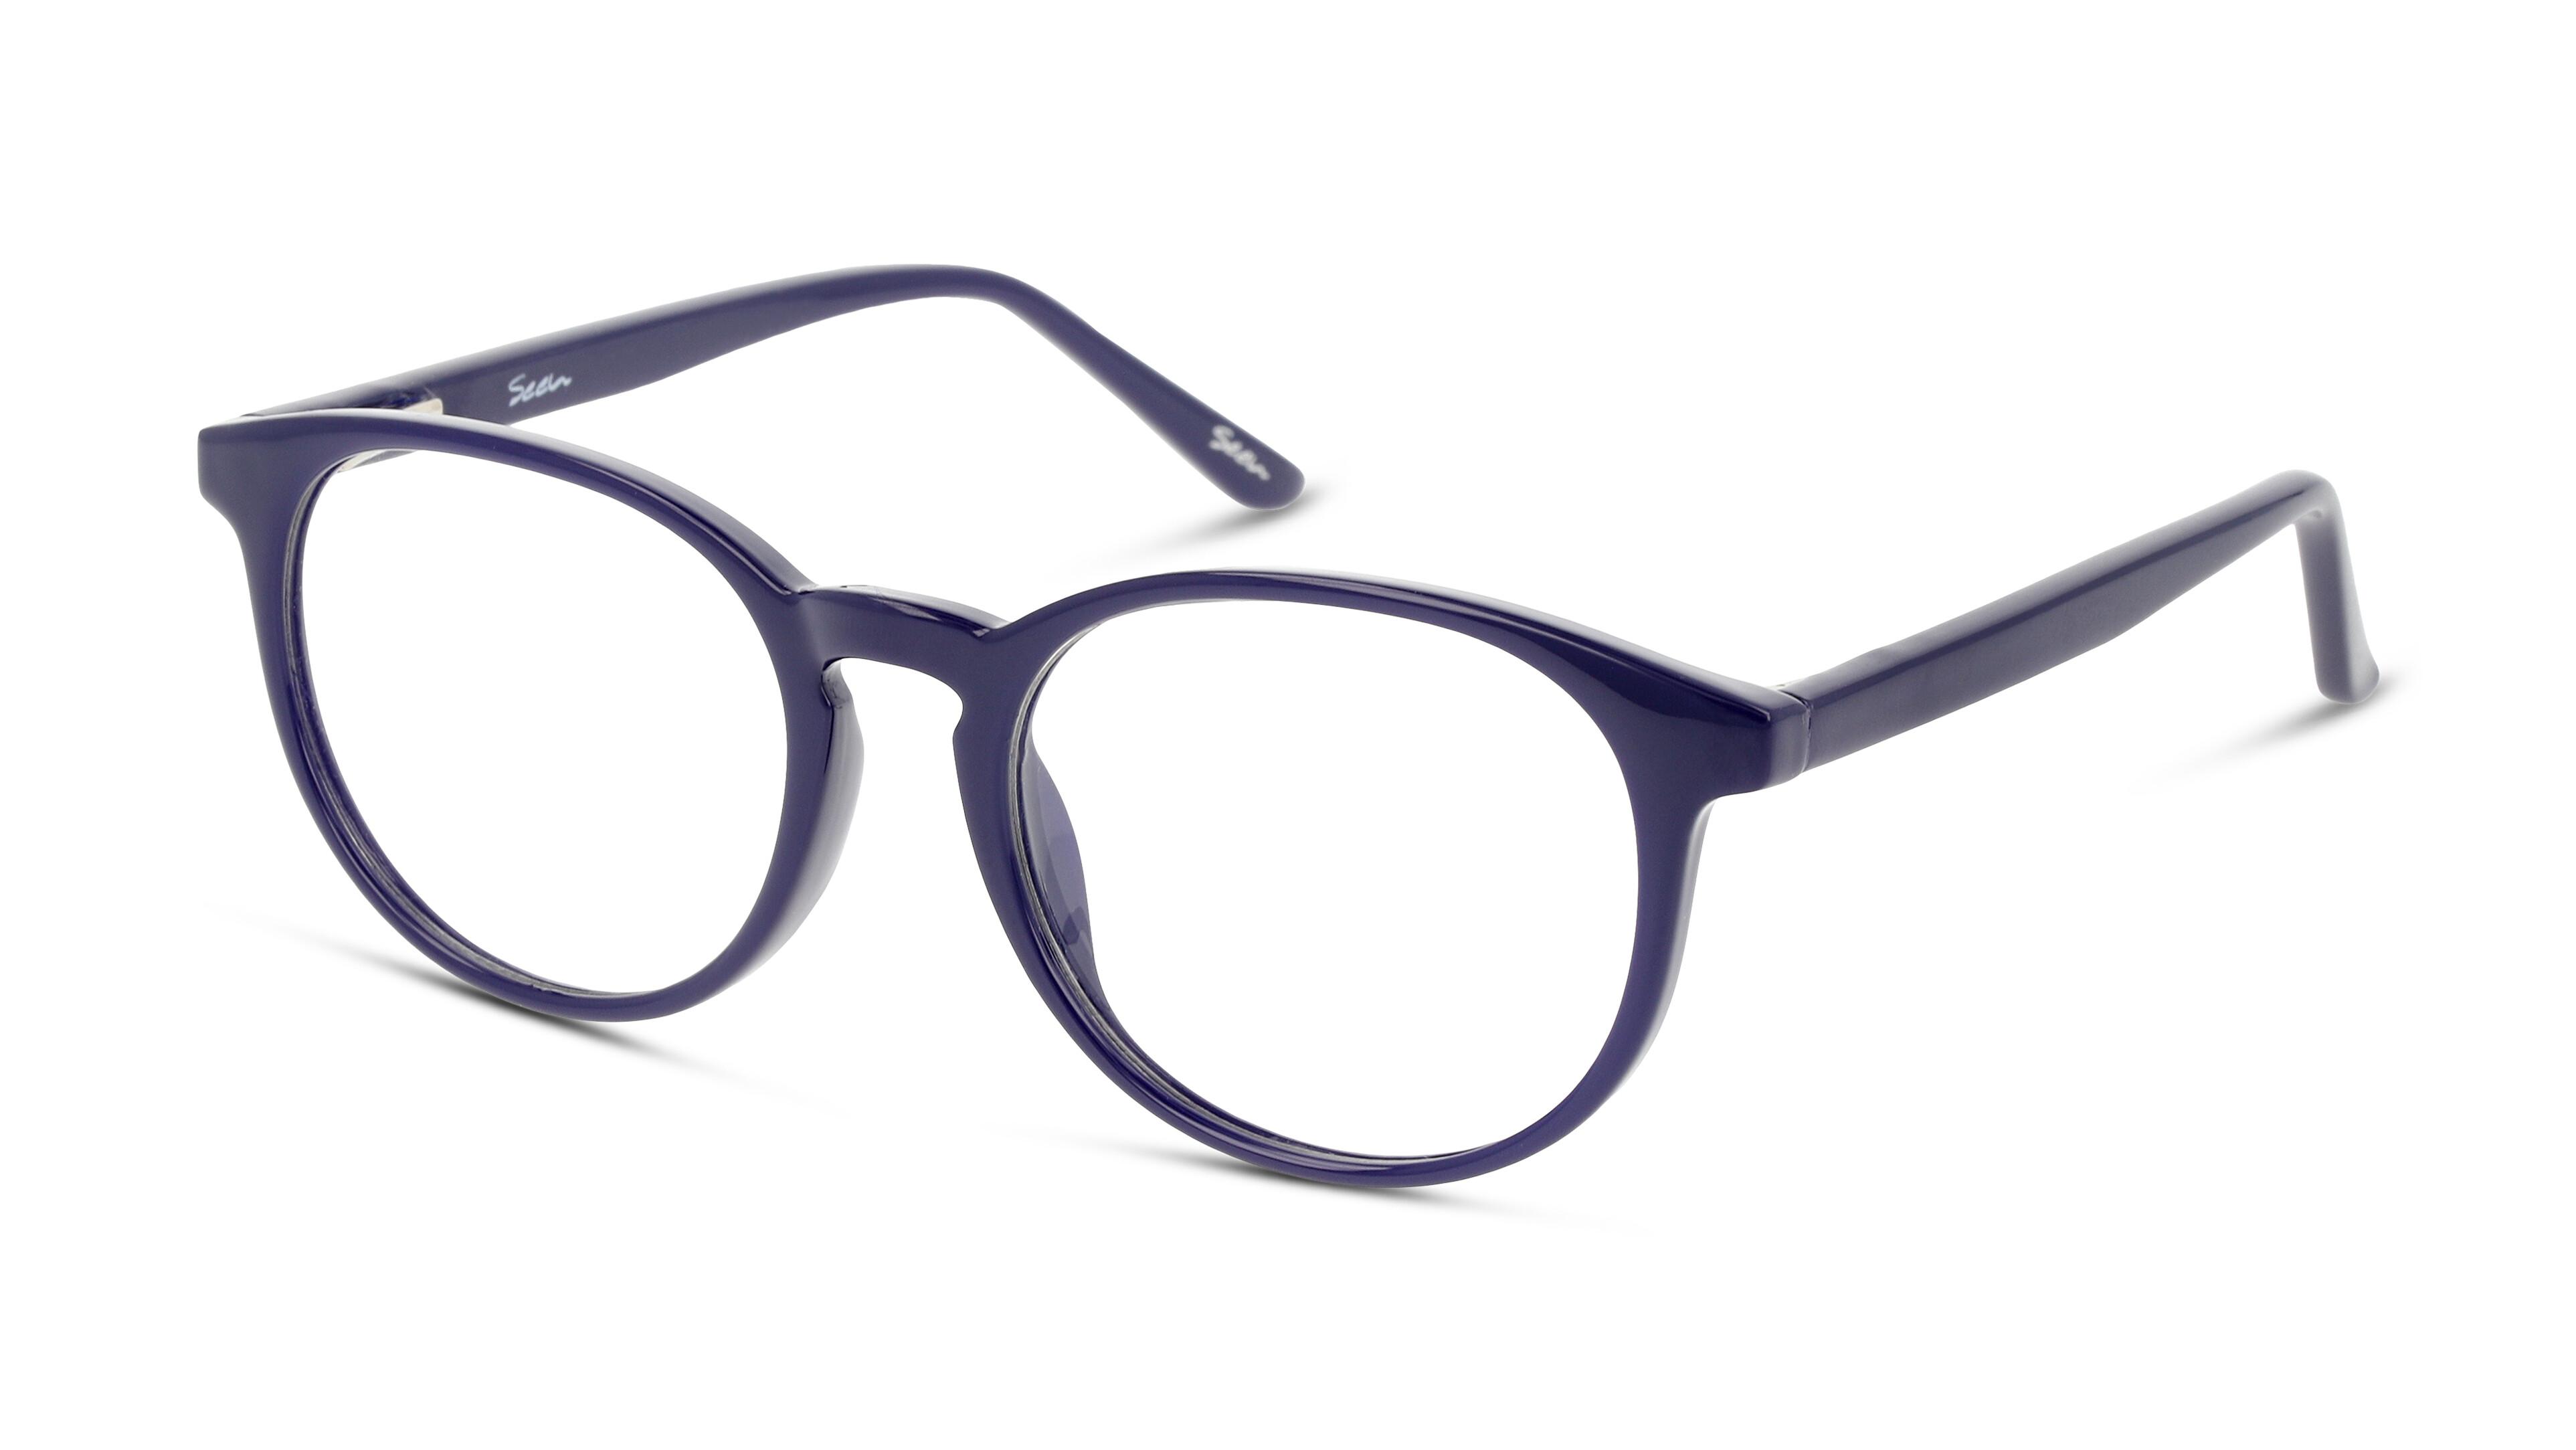 8719154678547-angle-brillenfassung-seen-snjt02-navy-blue-other